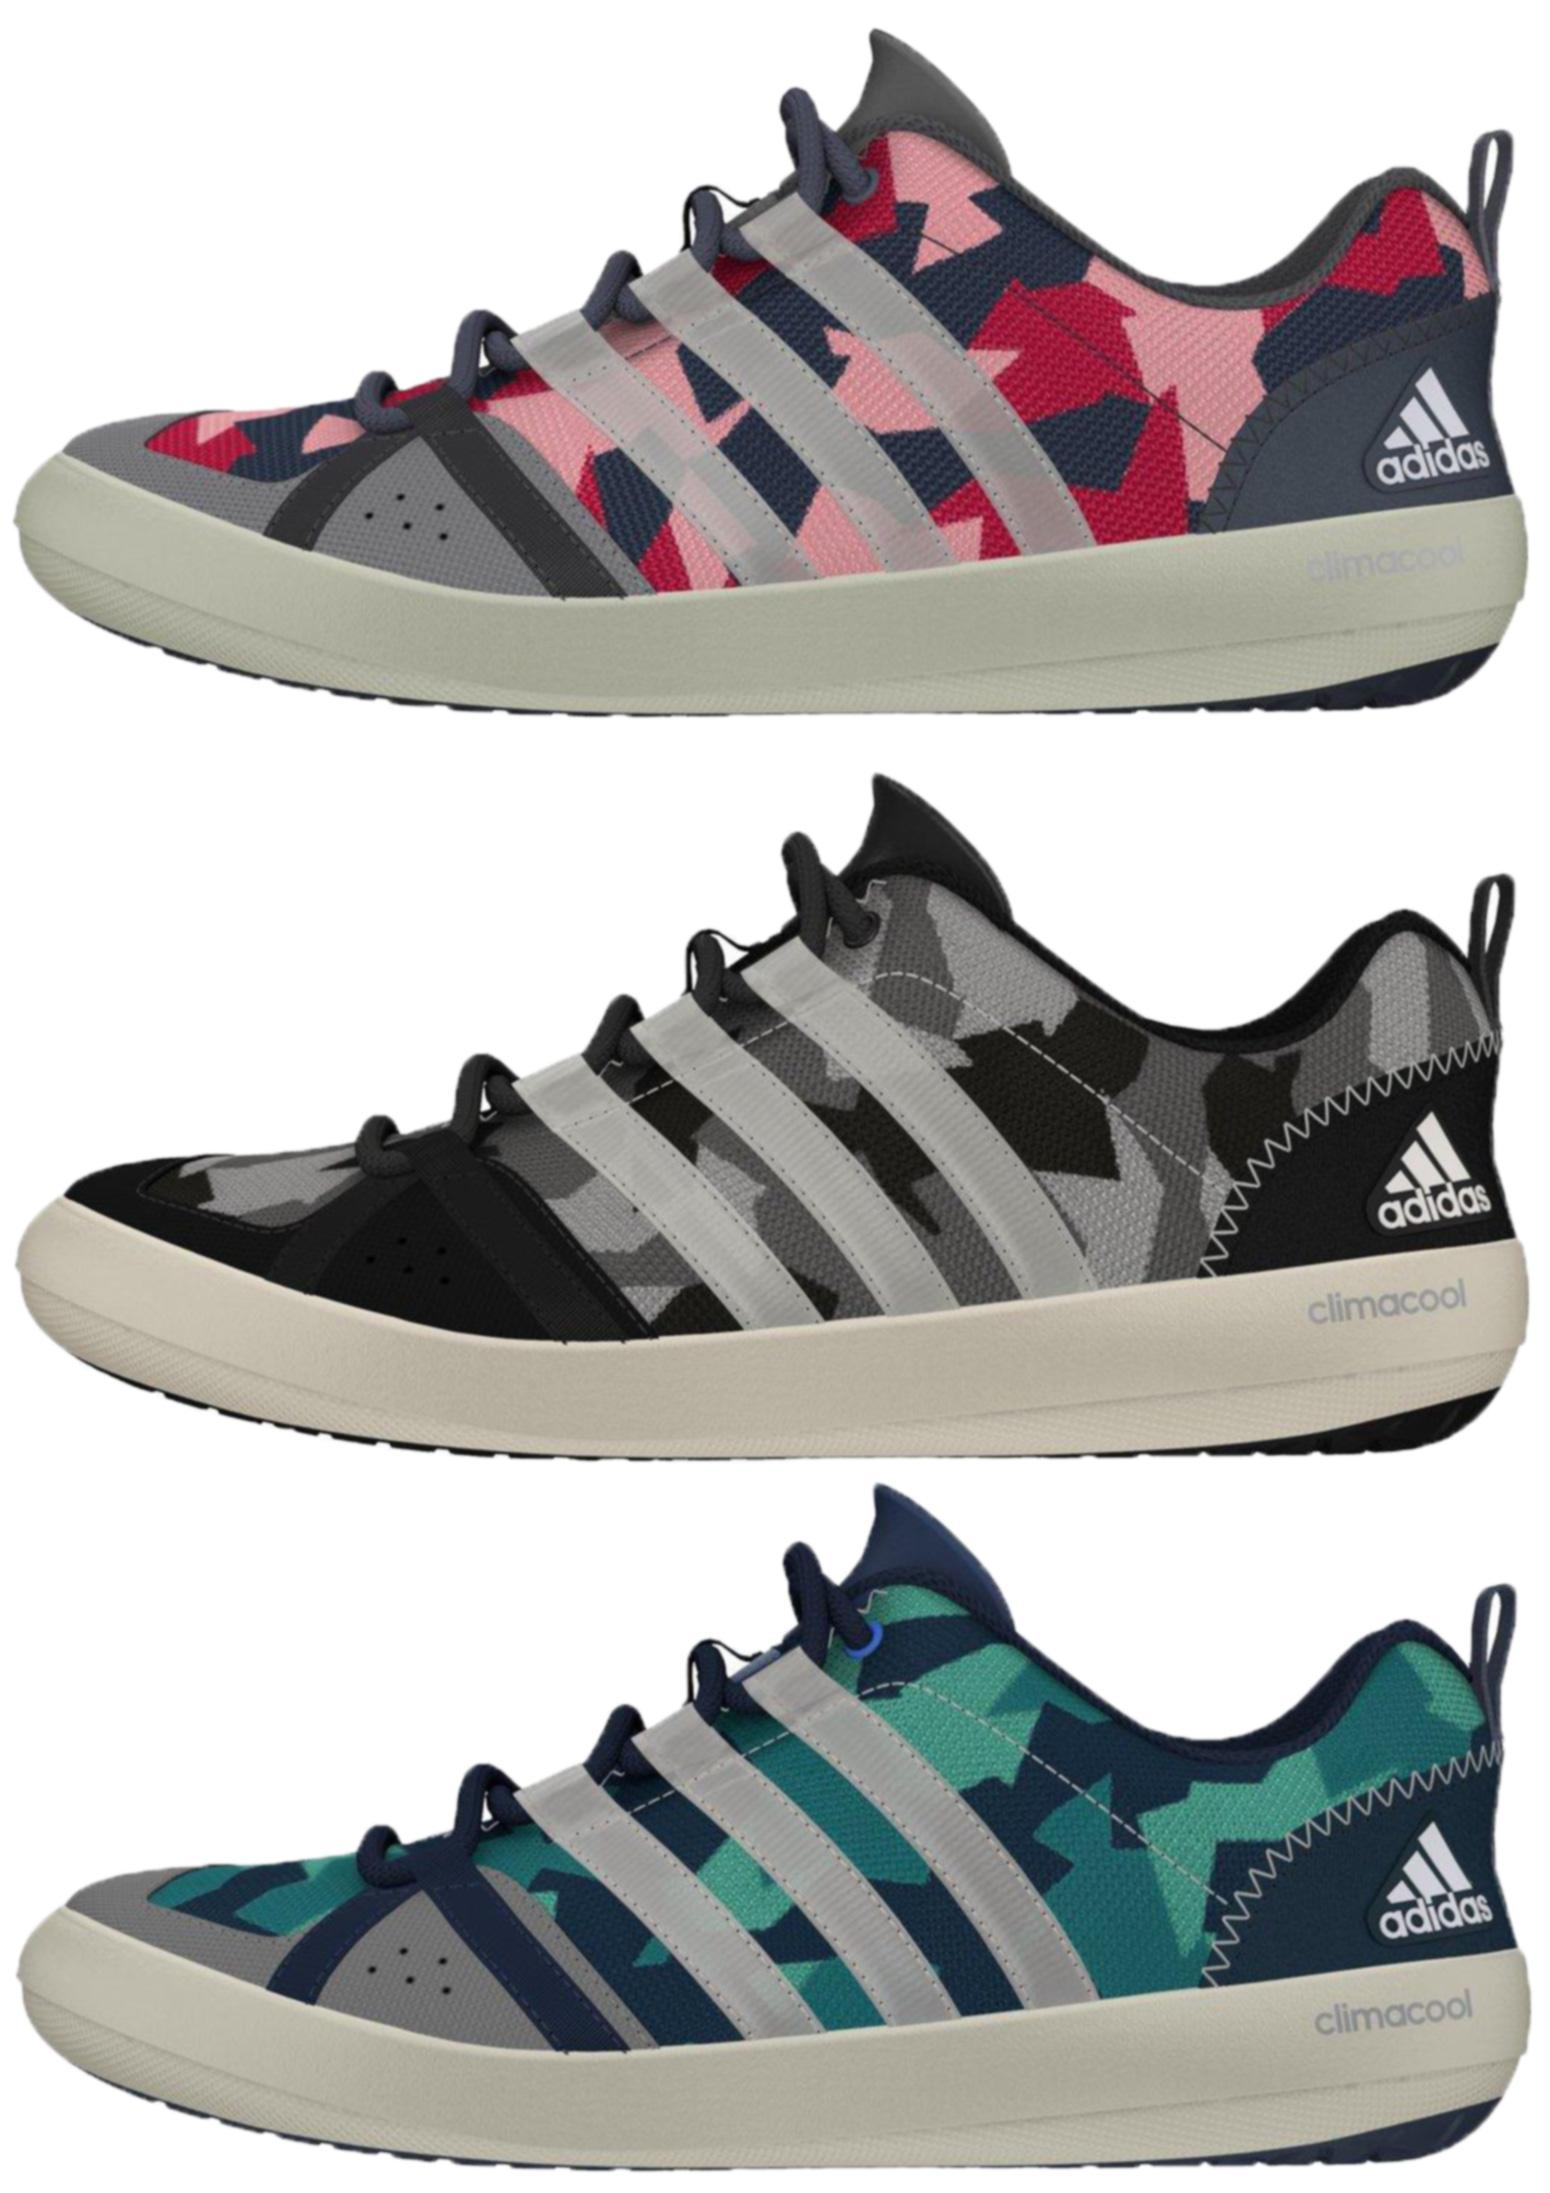 rote adidas schuhe, Damen&Herren Adidas Climacool Boat Lace